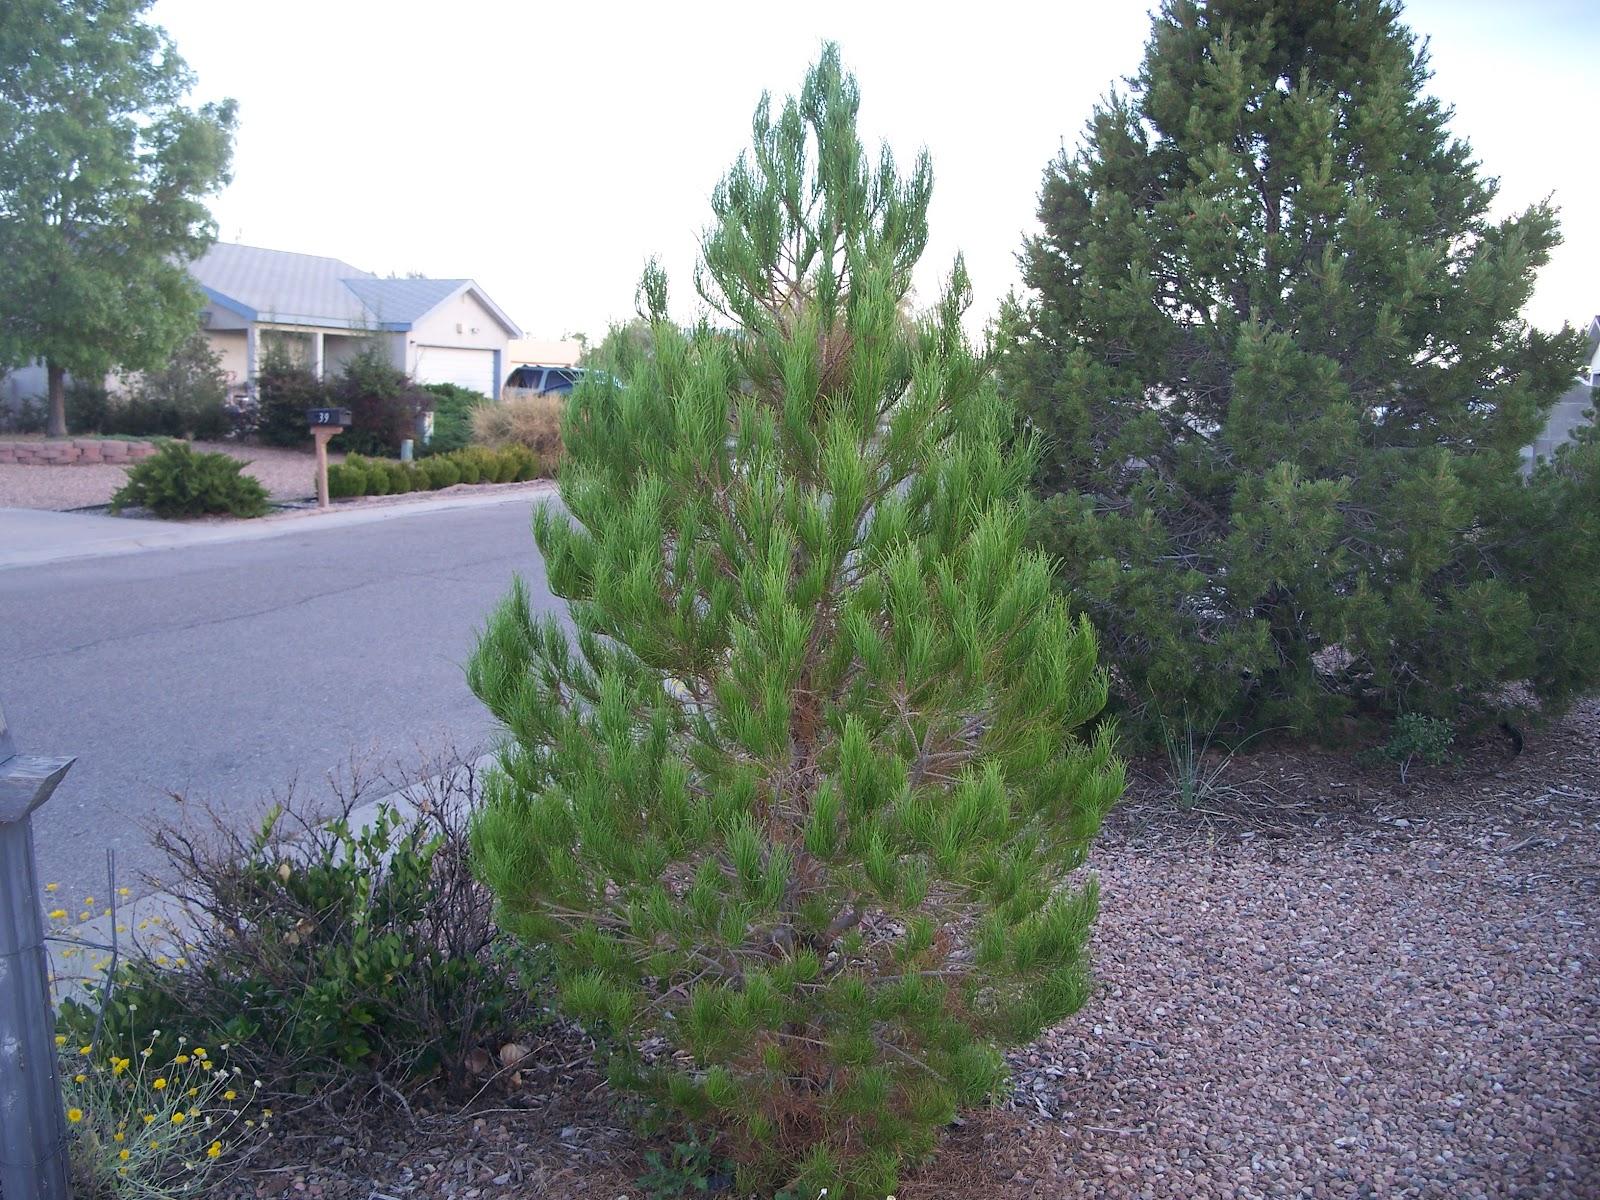 Afghan pine tree photos afghan pine trees for sale myideasbedroom